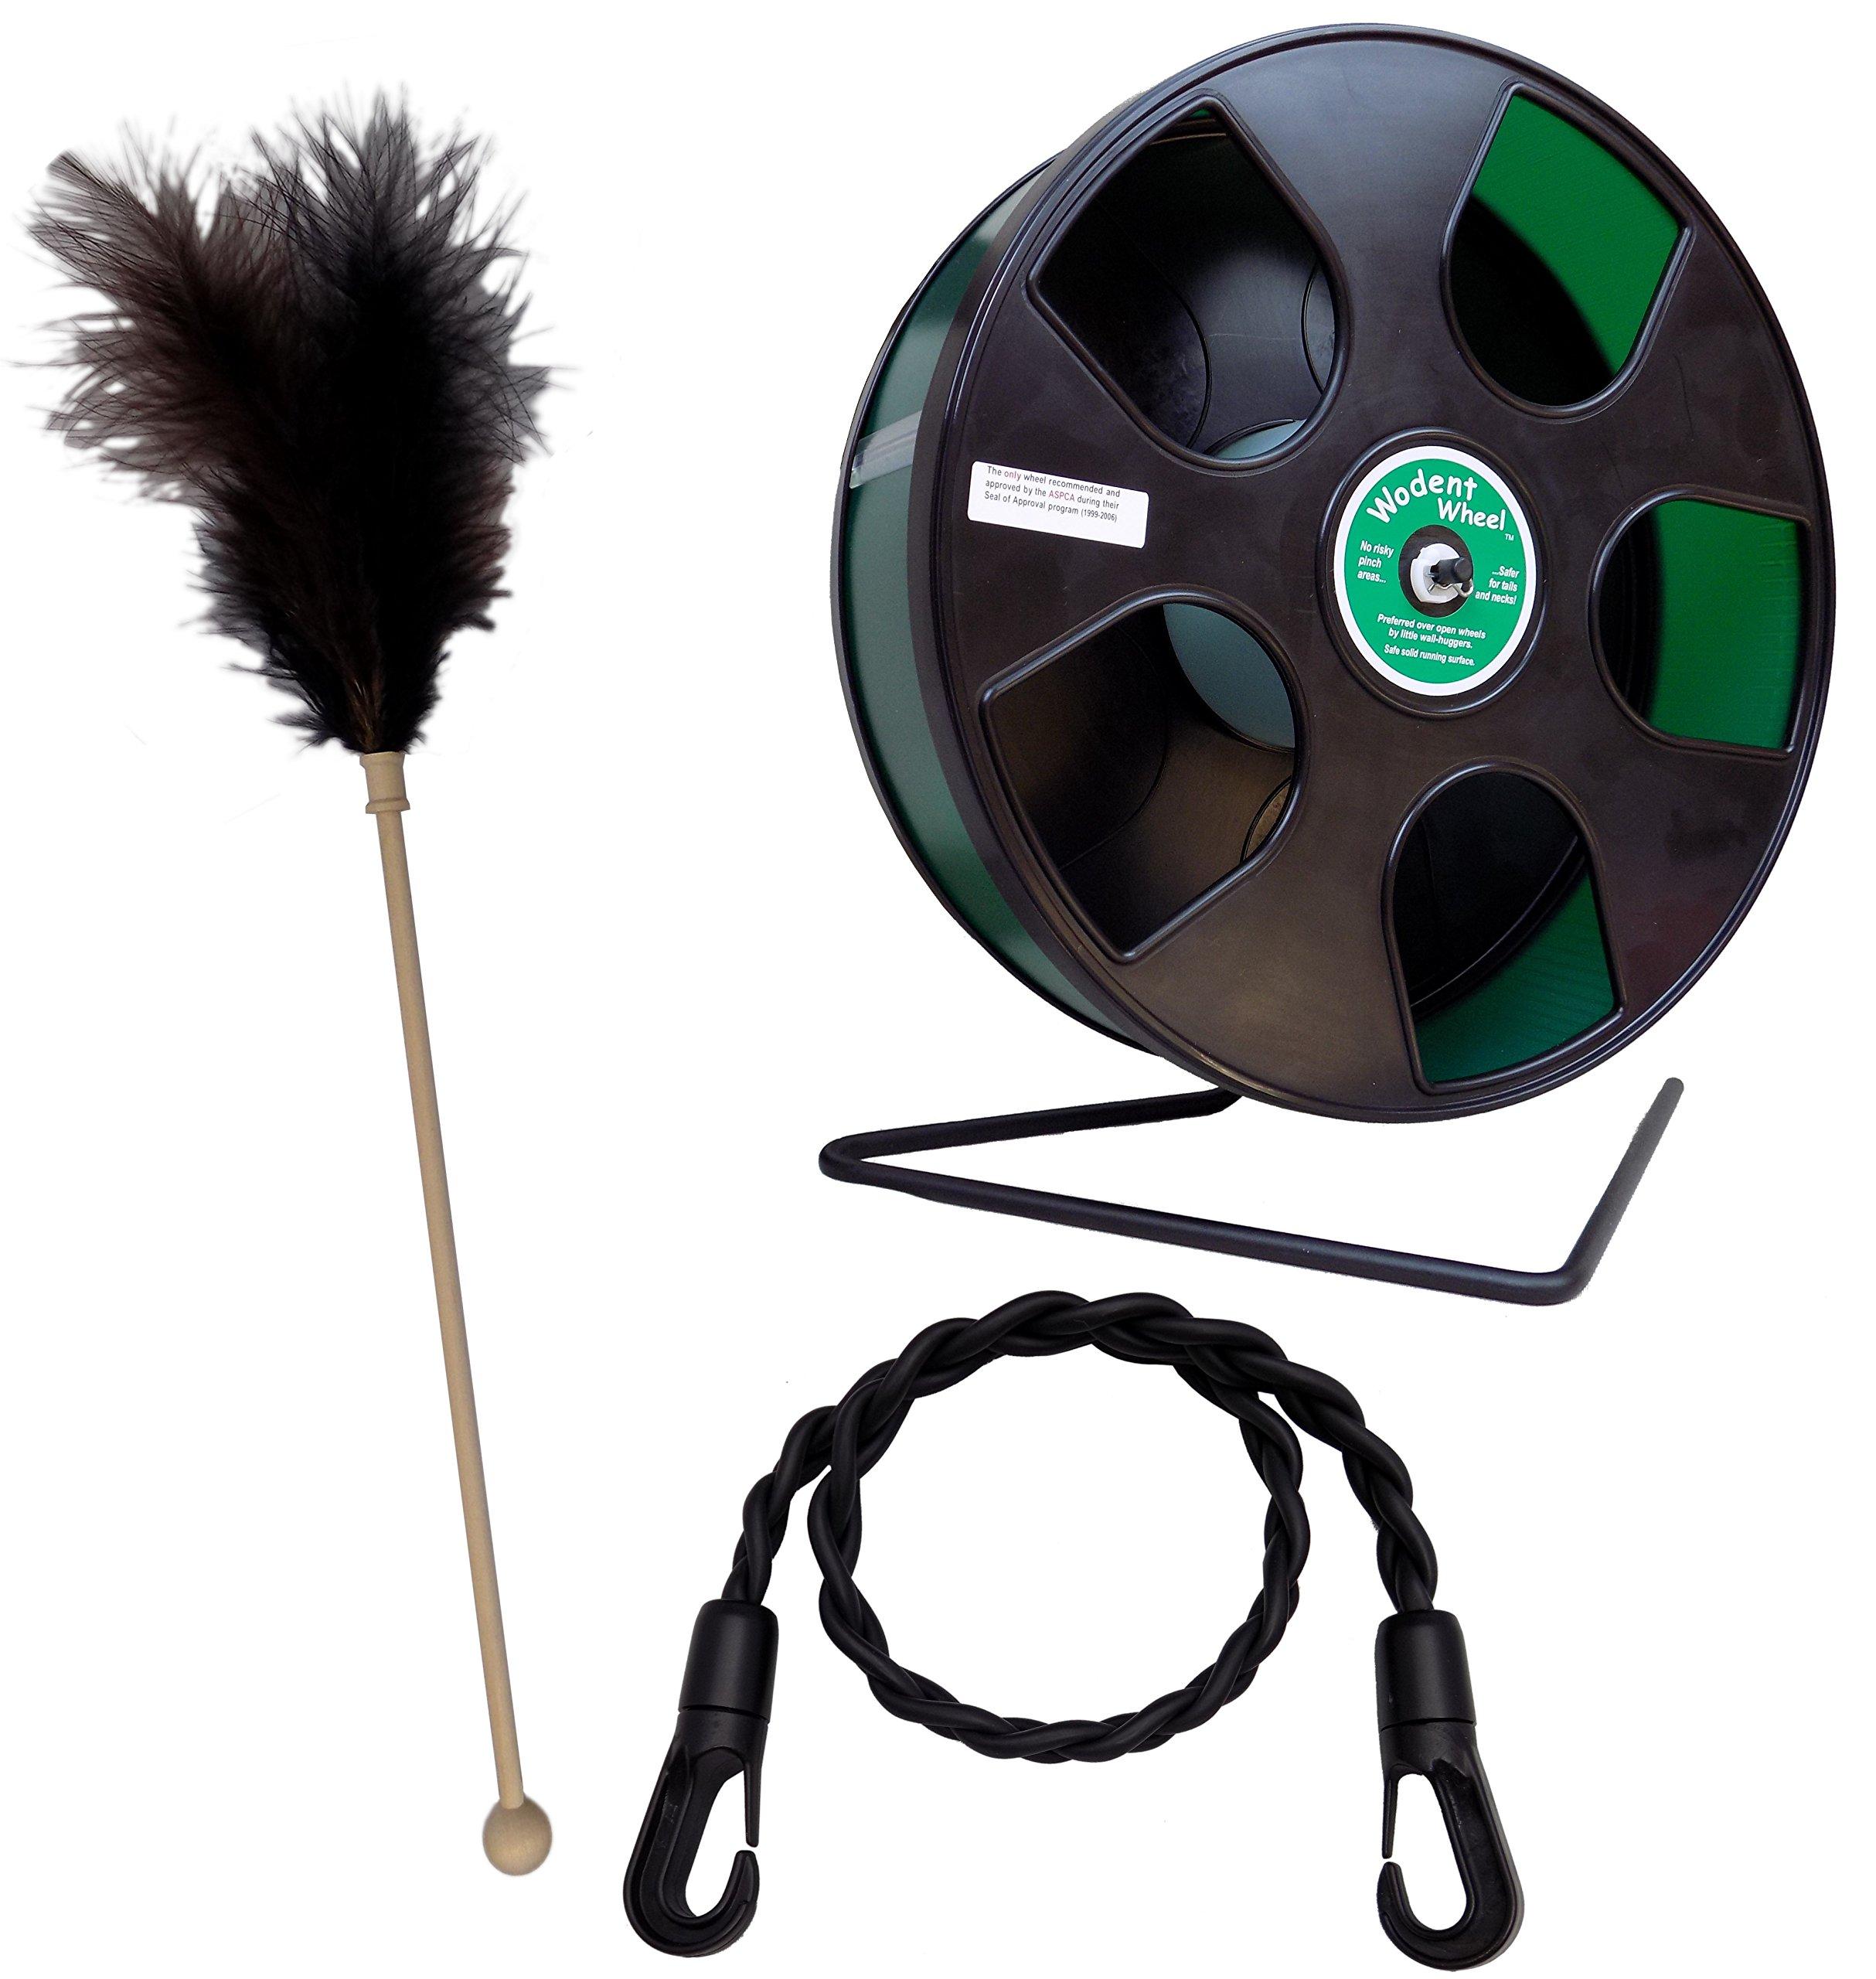 Sugar Glider Toy Pack - Feather, Wodent Wheel, Rope Toy by Suncoast Sugar Gliders by Suncoast Sugar Gliders